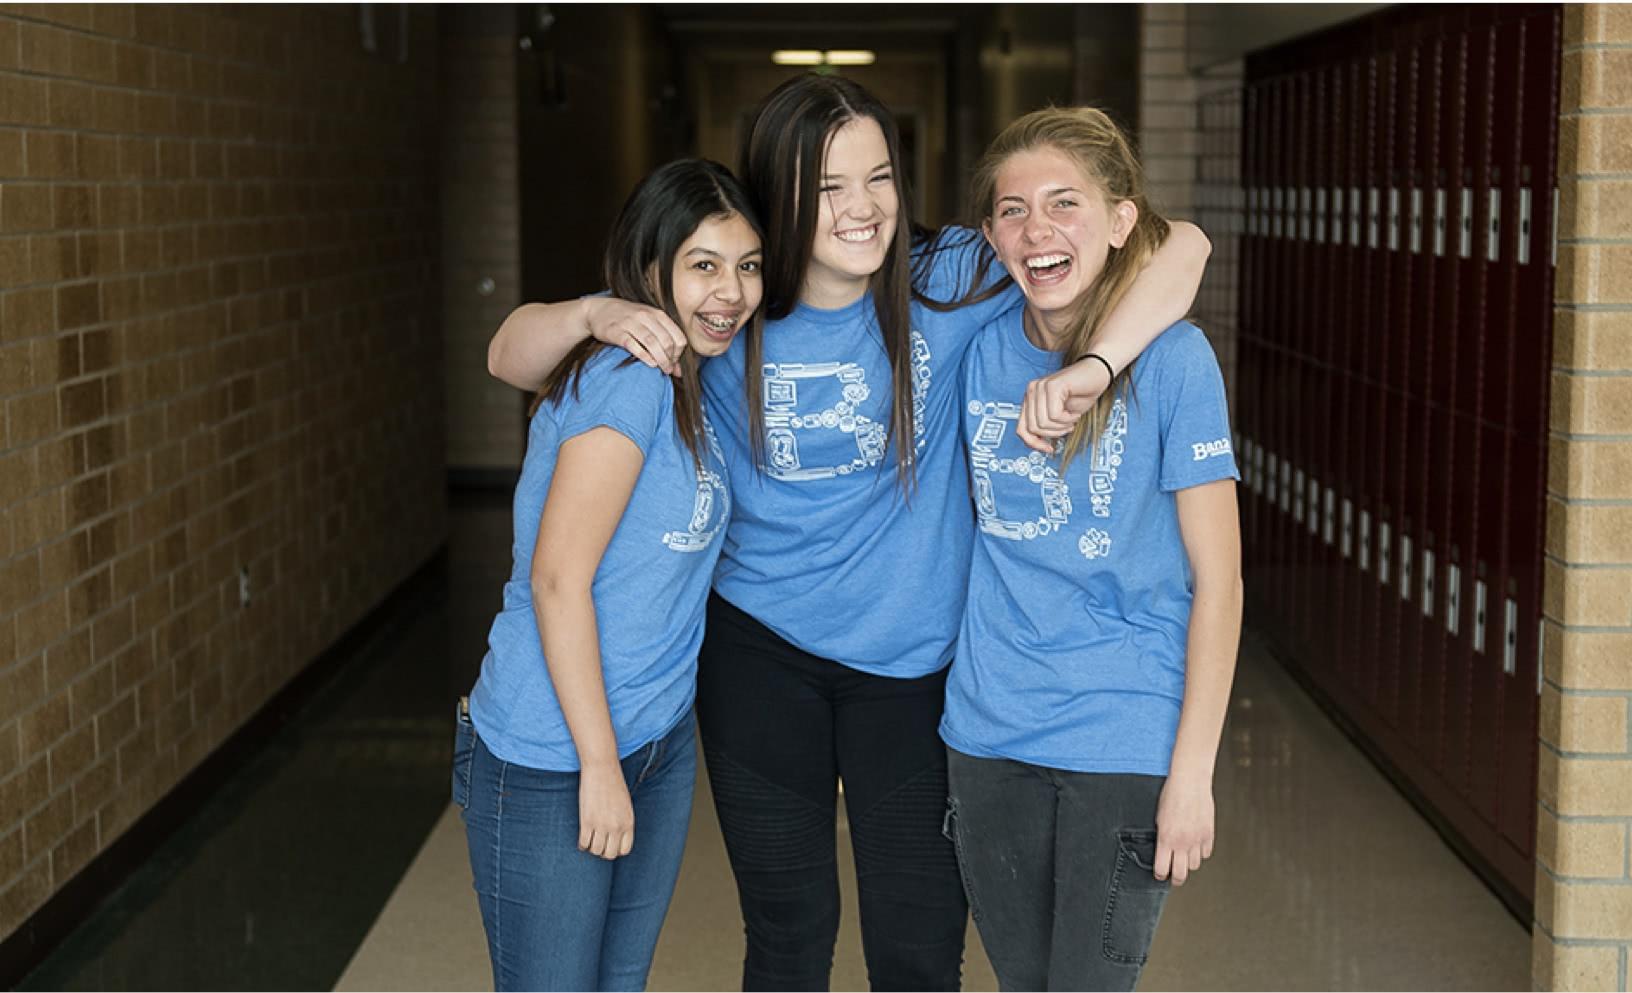 Students wearing Banzai t-shirts